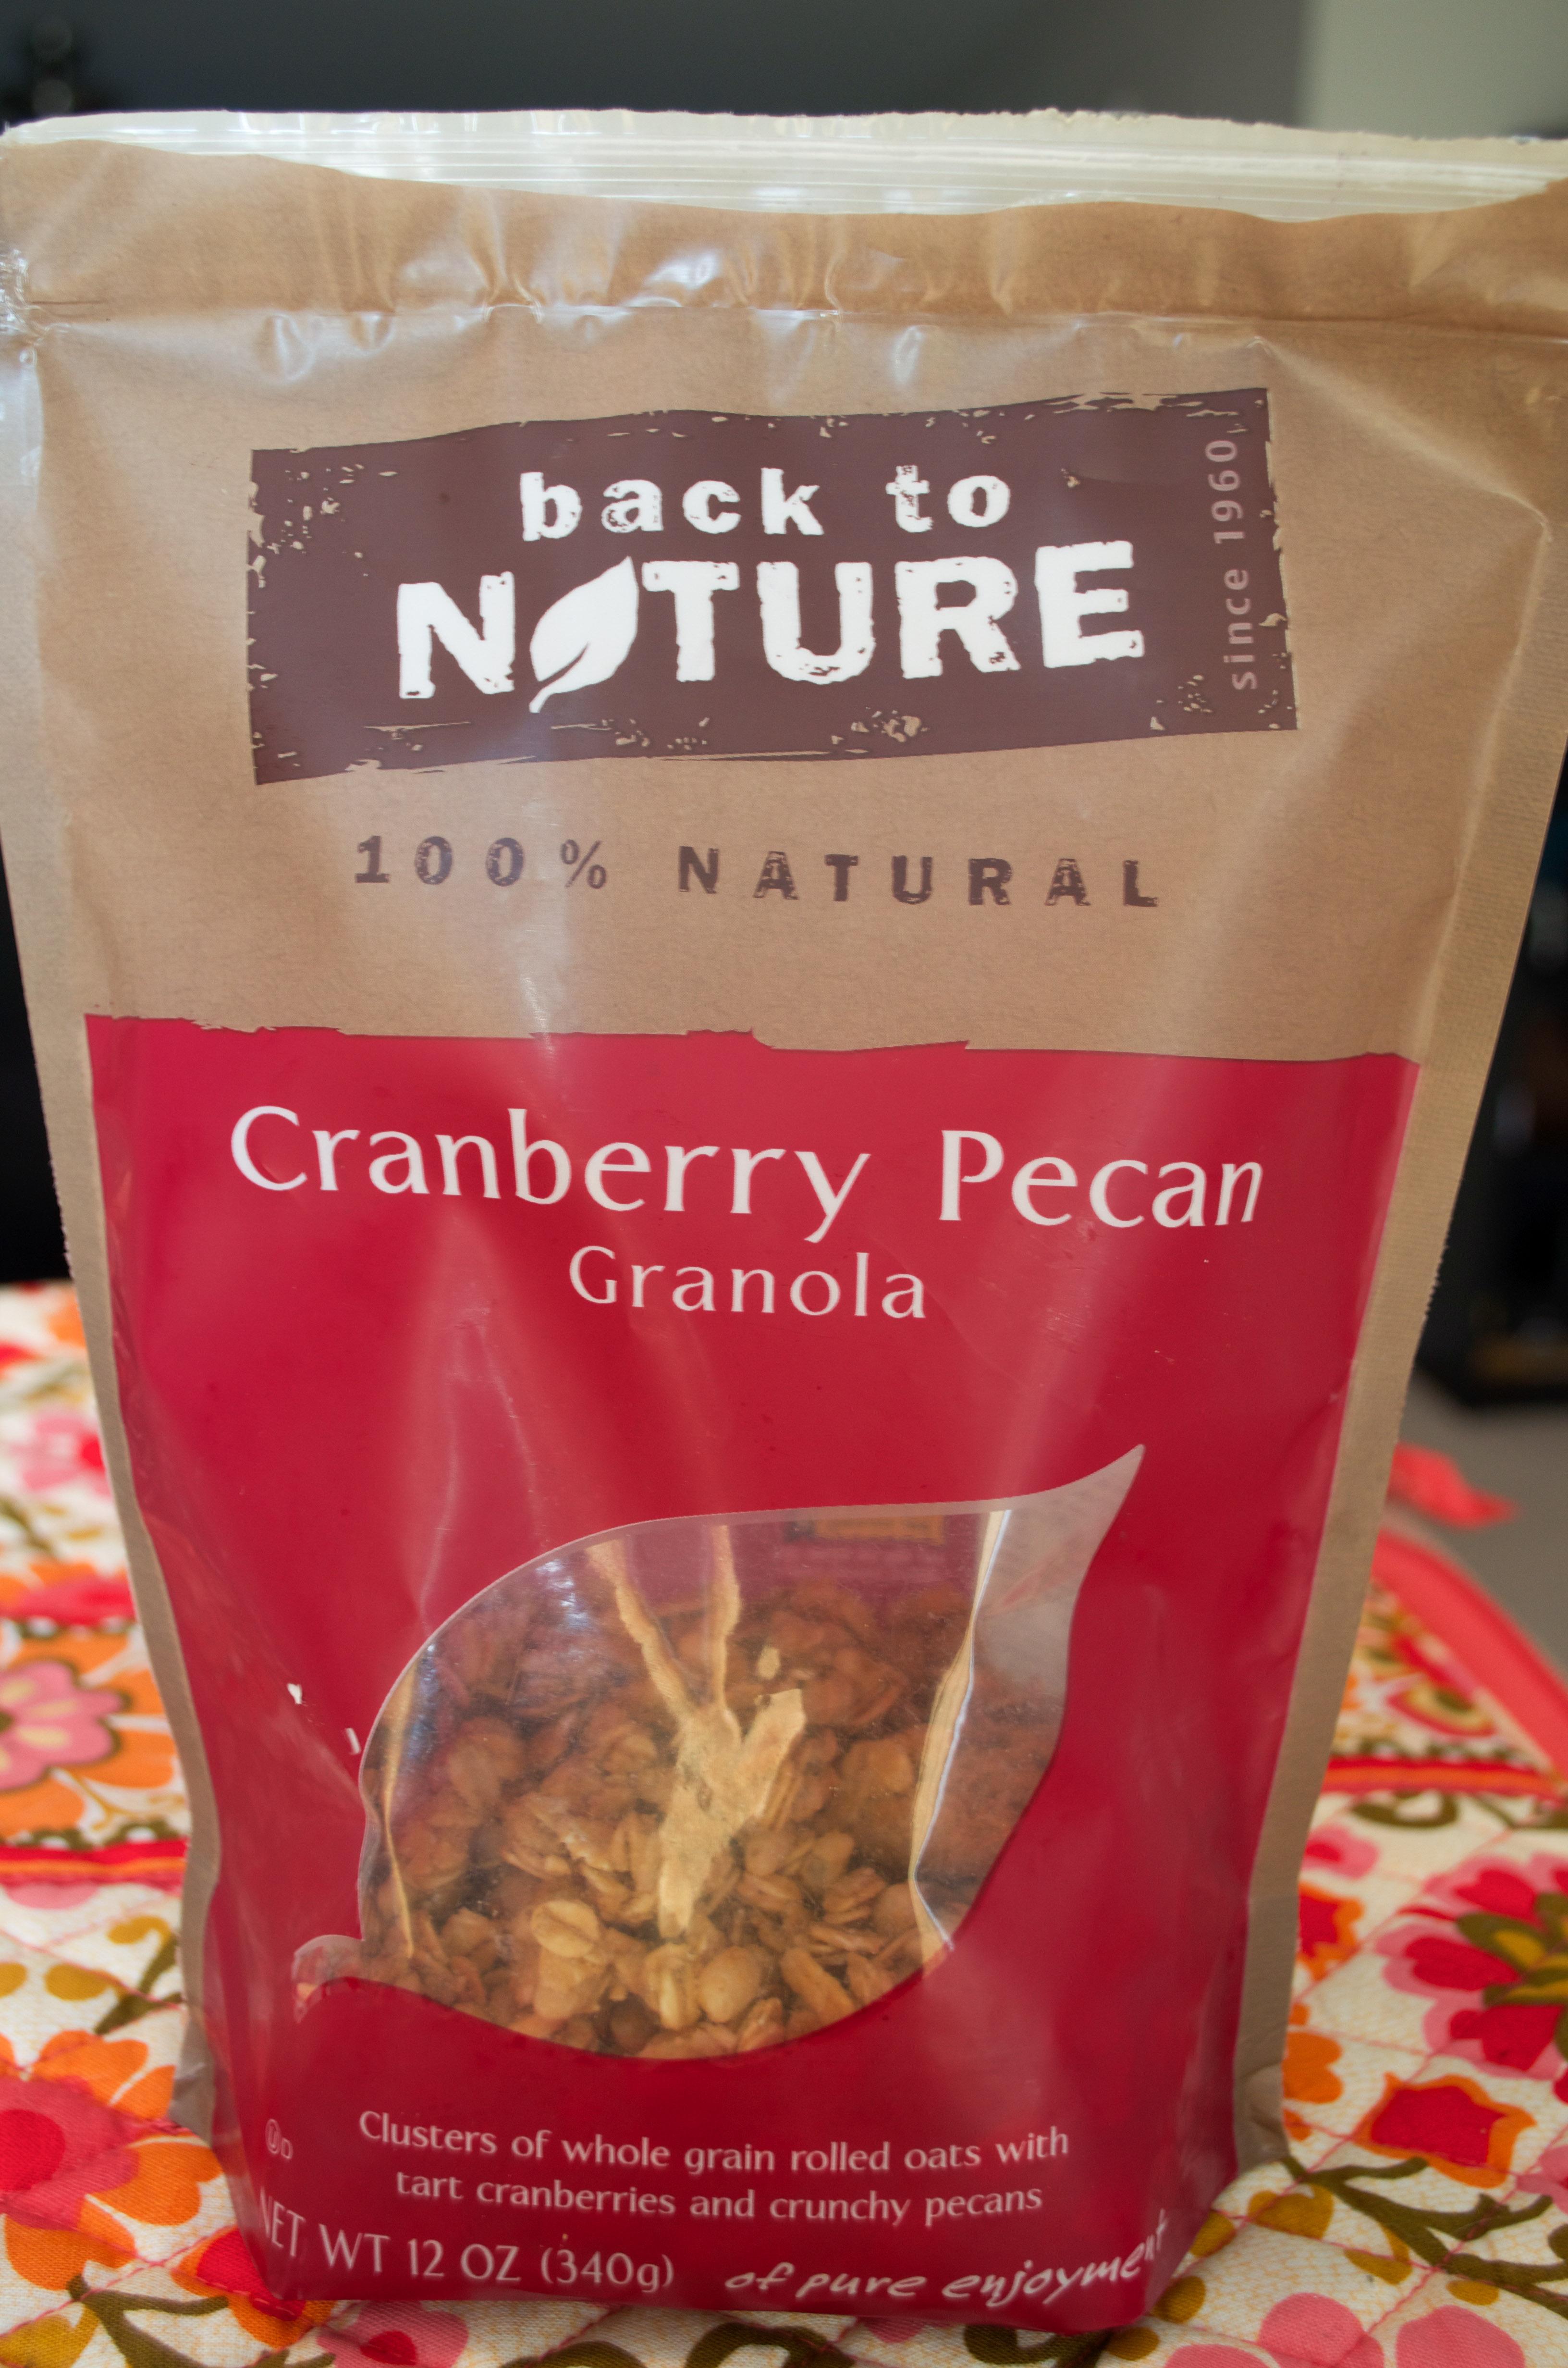 Back to Nature- Cranberry Pecan Granola